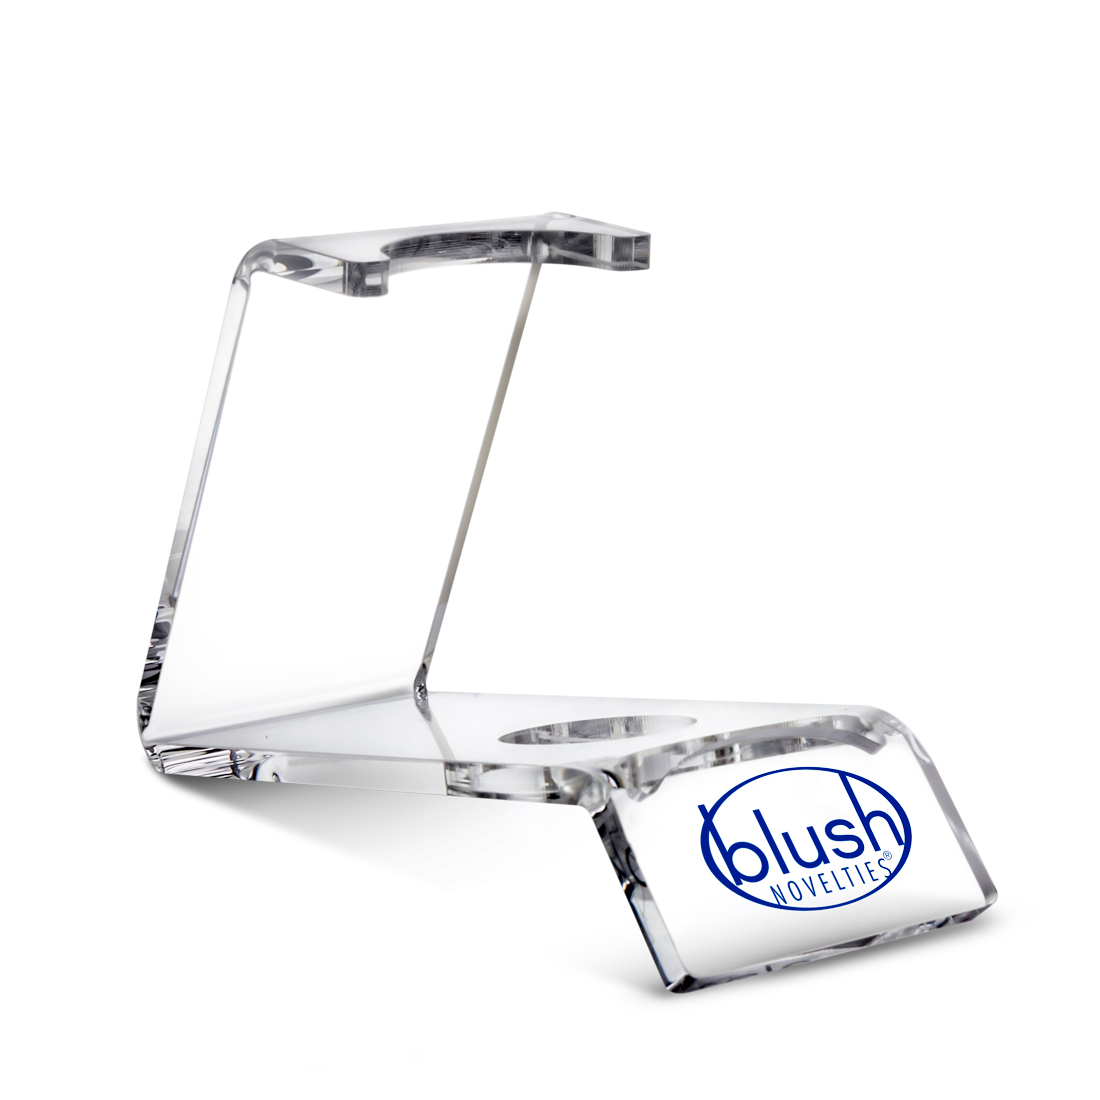 Blush - Acrylic Tester Display